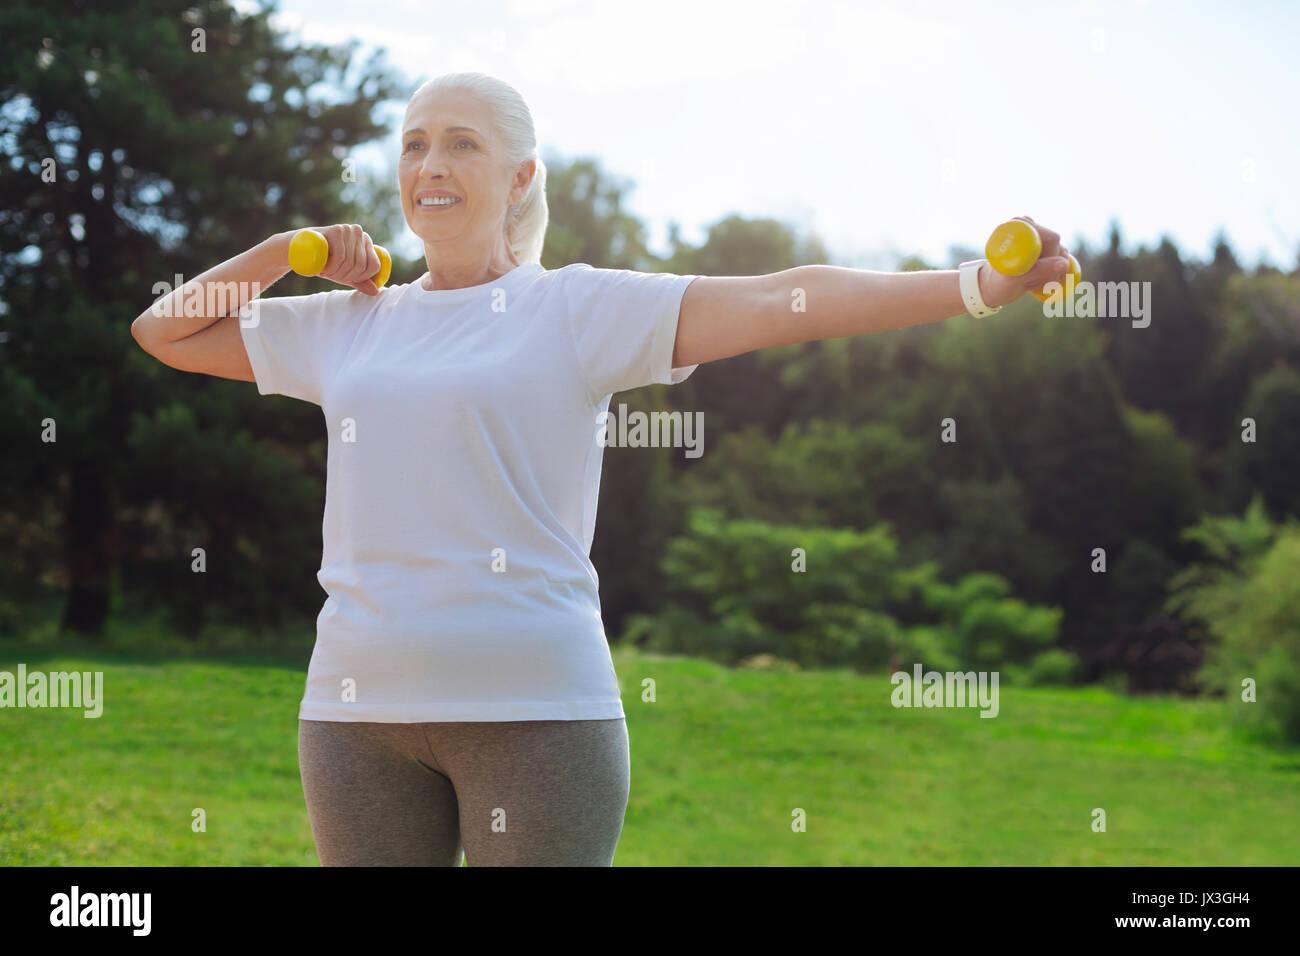 Healthy female using her dumbbells - Stock Image